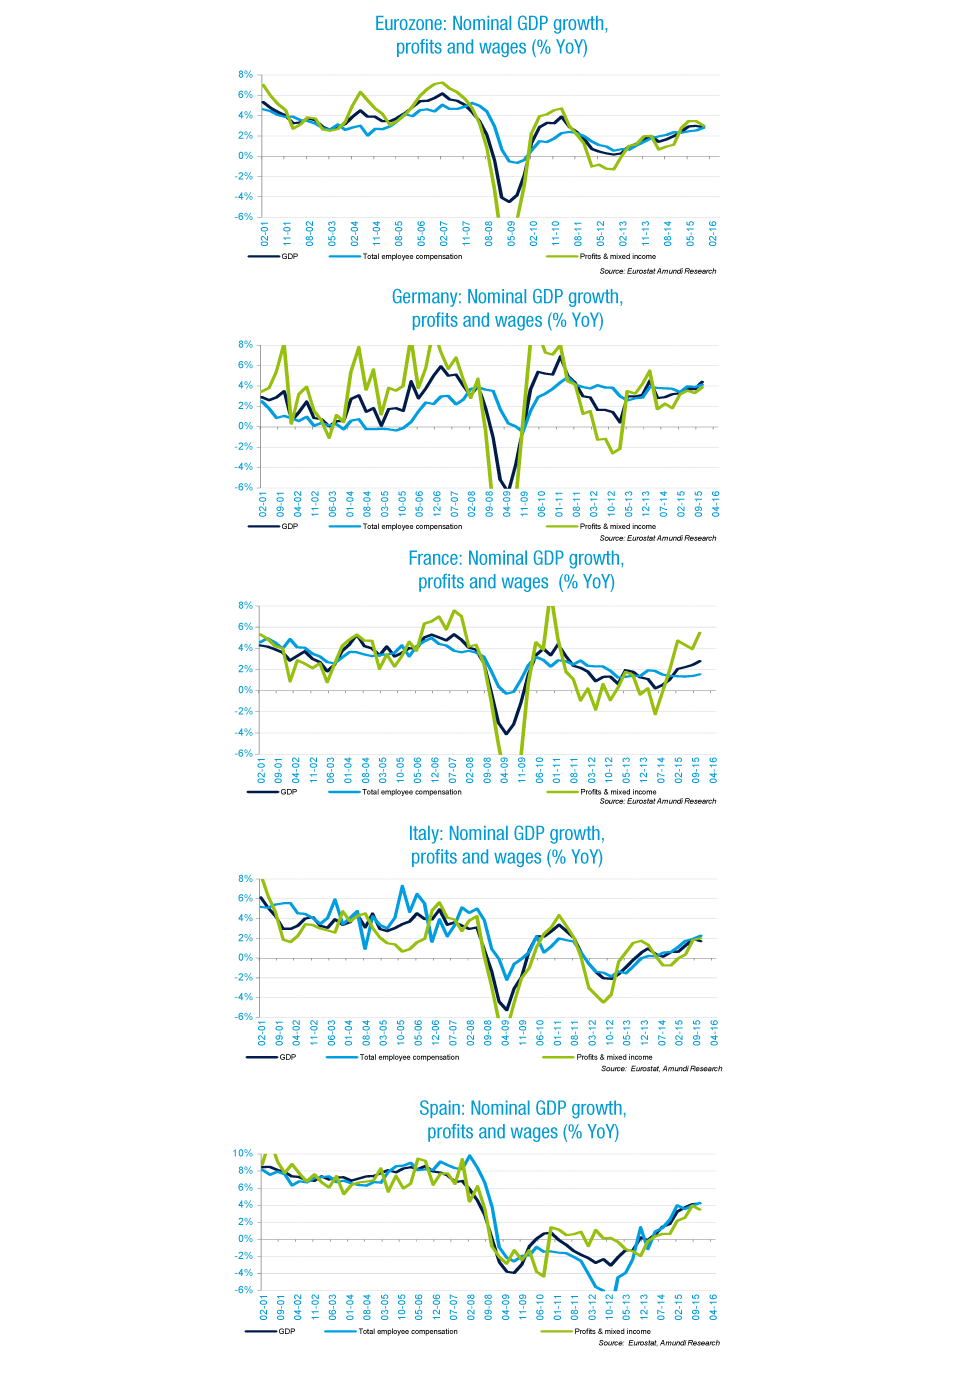 Graph-employee-euro-aera